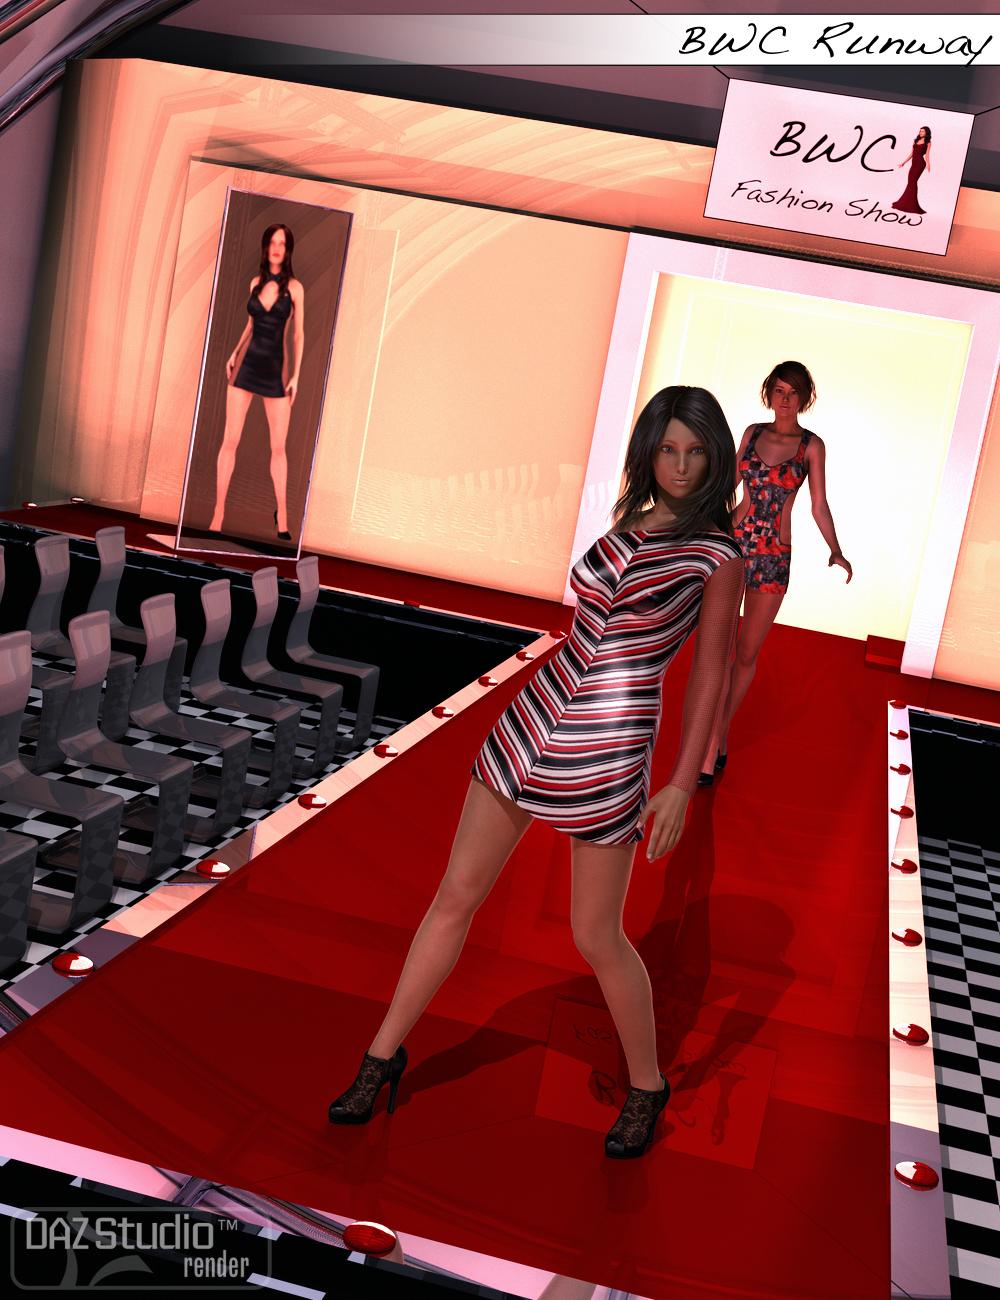 BWC Runway by: Sedor, 3D Models by Daz 3D